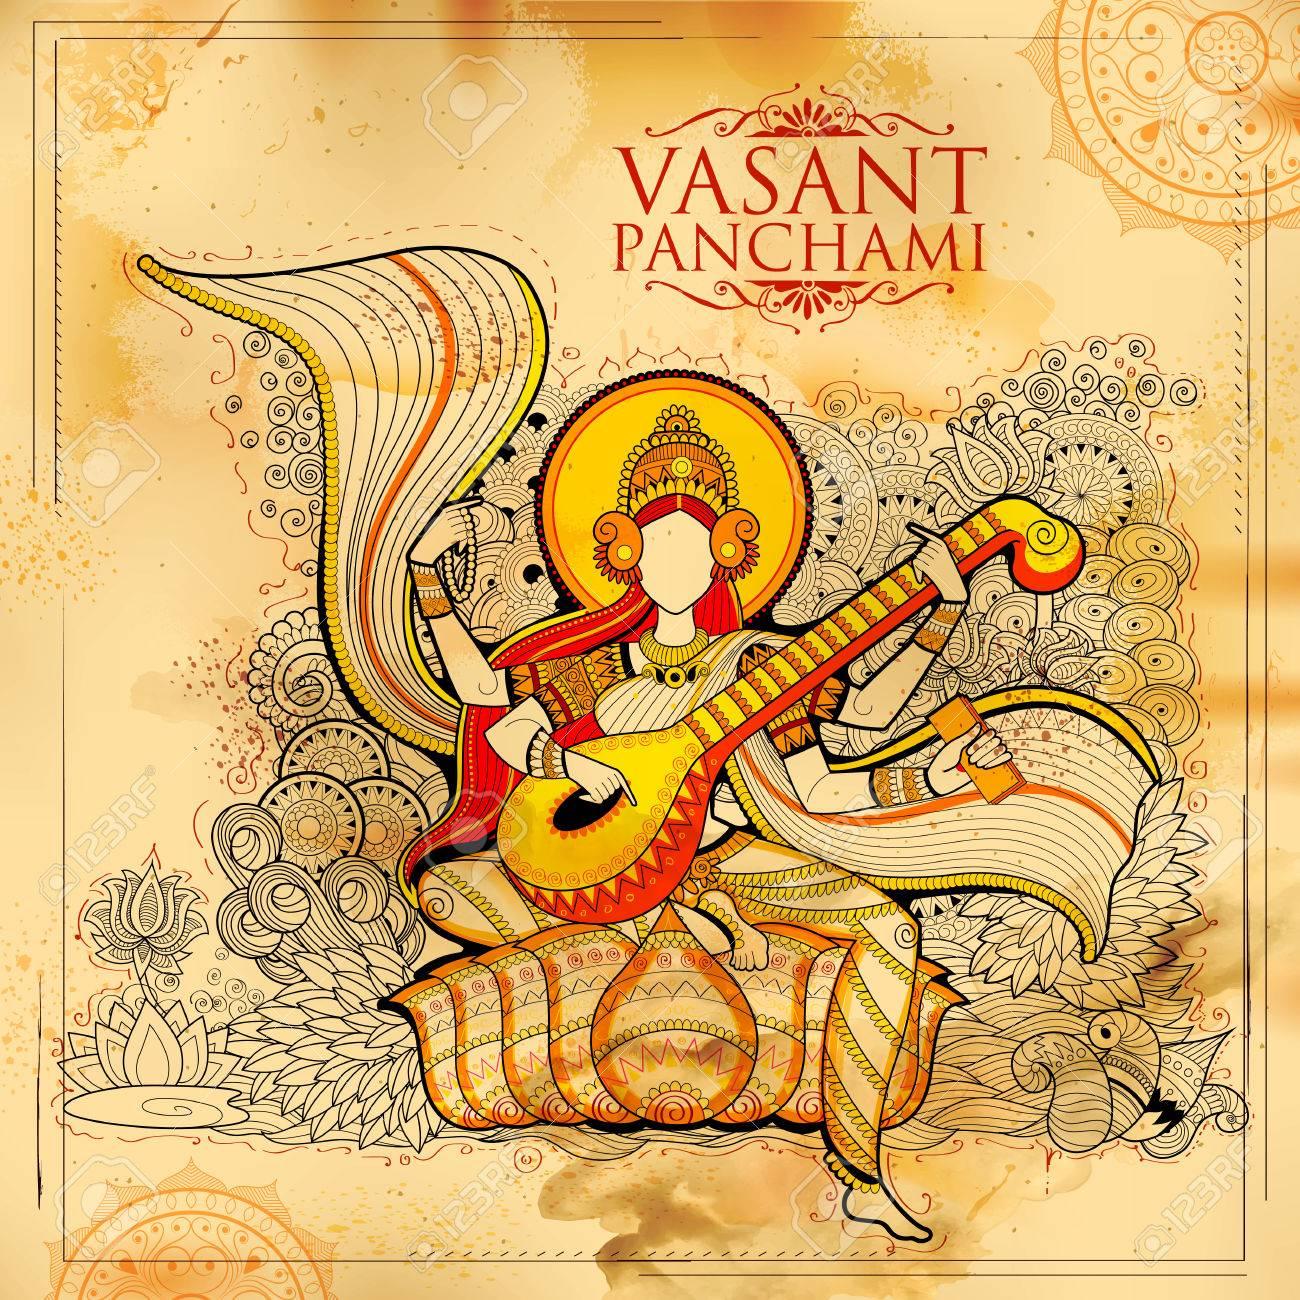 Goddess of Wisdom Saraswati for Vasant Panchami India festival background - 70671193